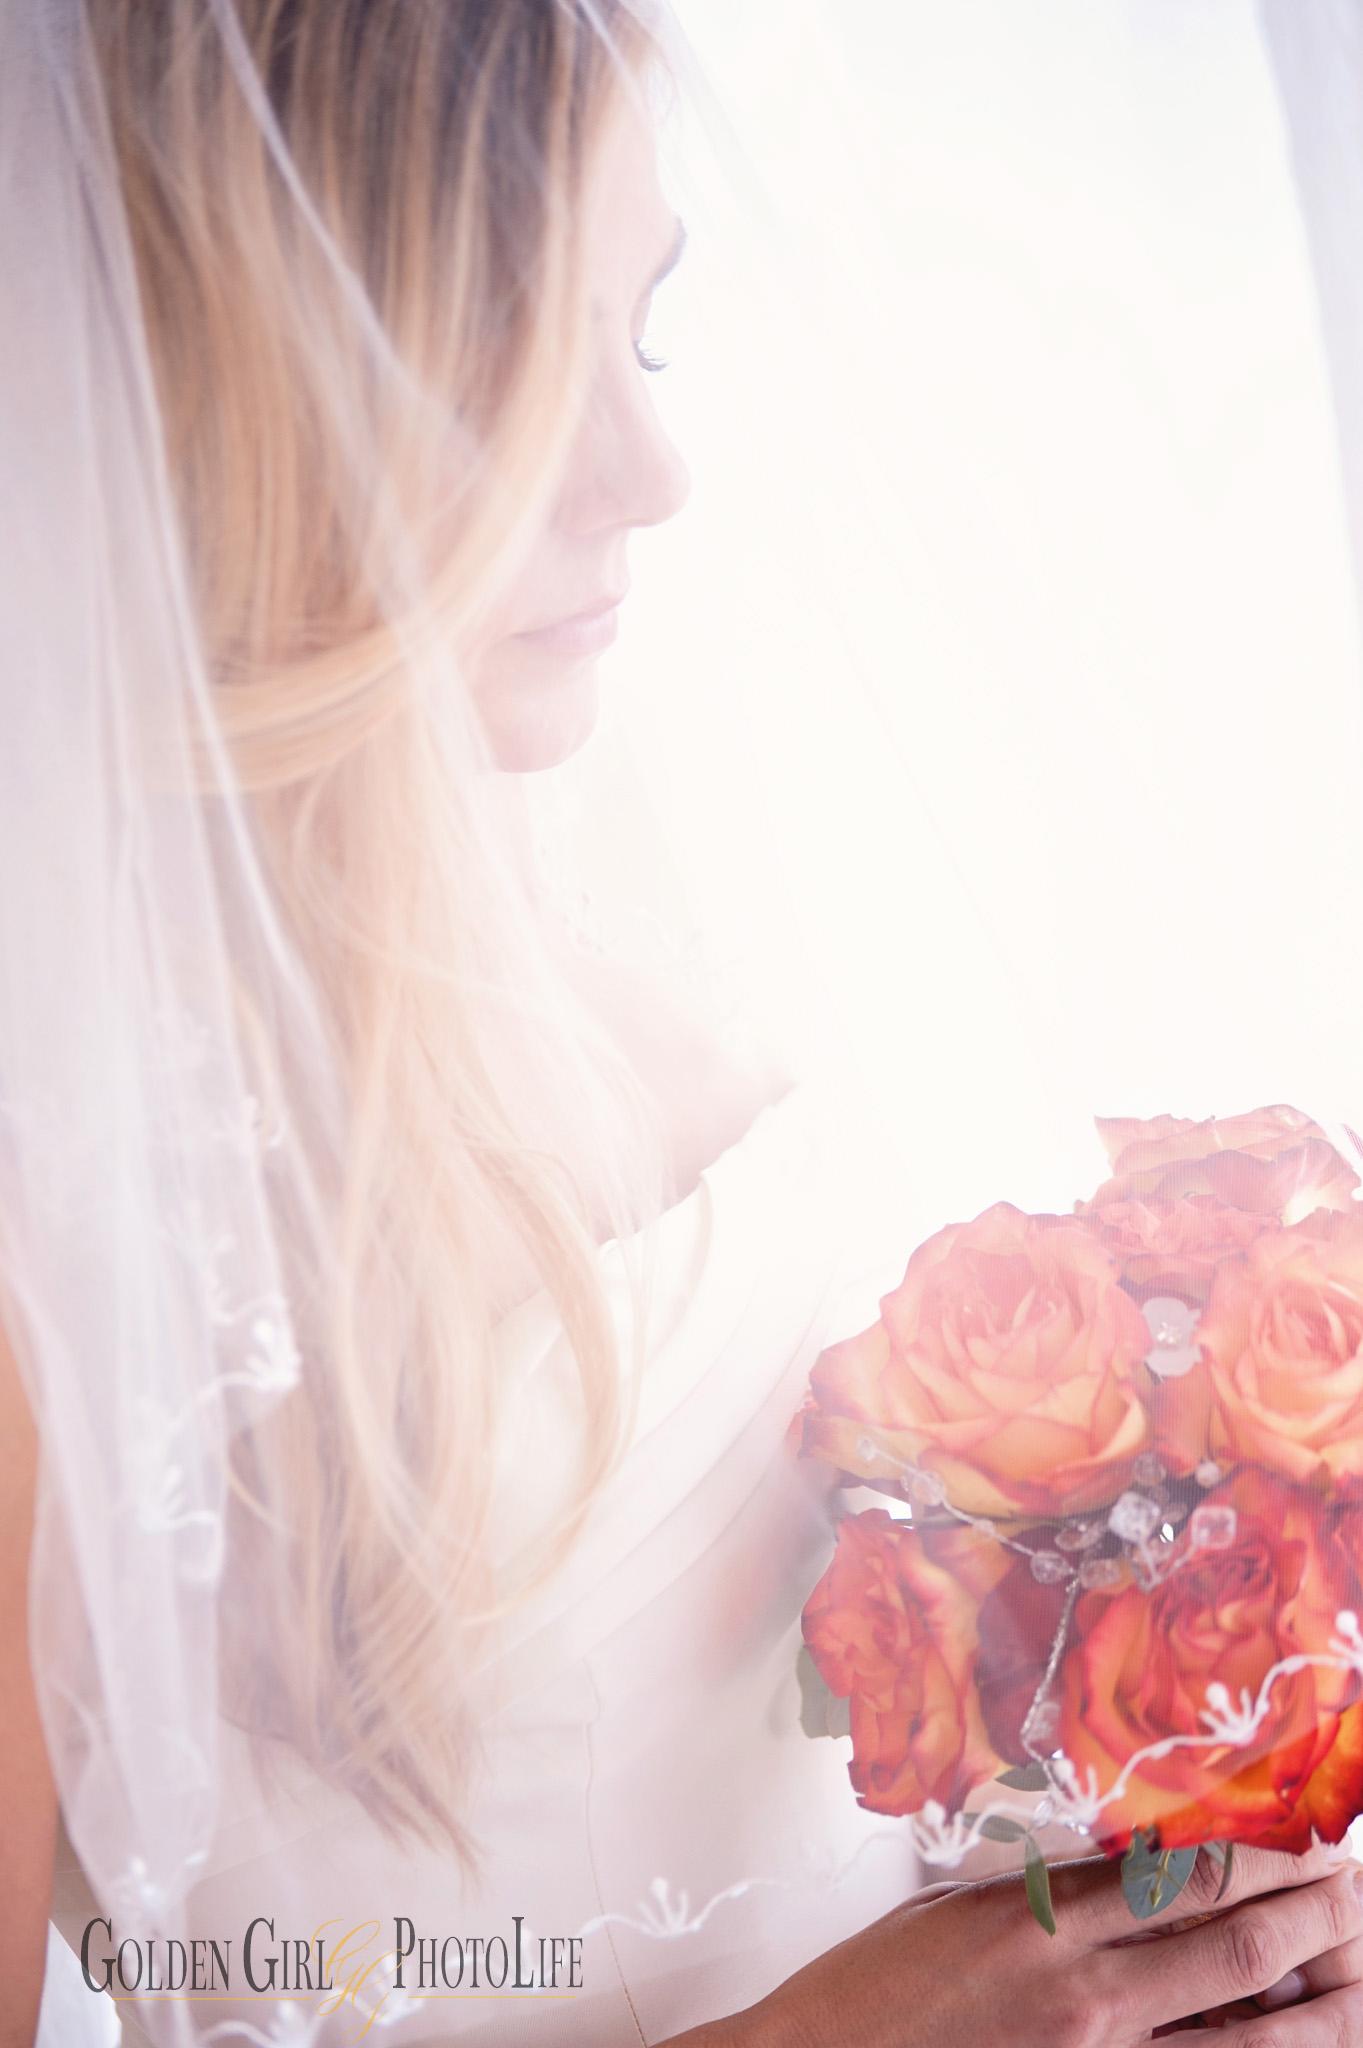 seattle-puget-sound-wedding-photographer-best-of-western-wa-king5-bridal-session.jpg